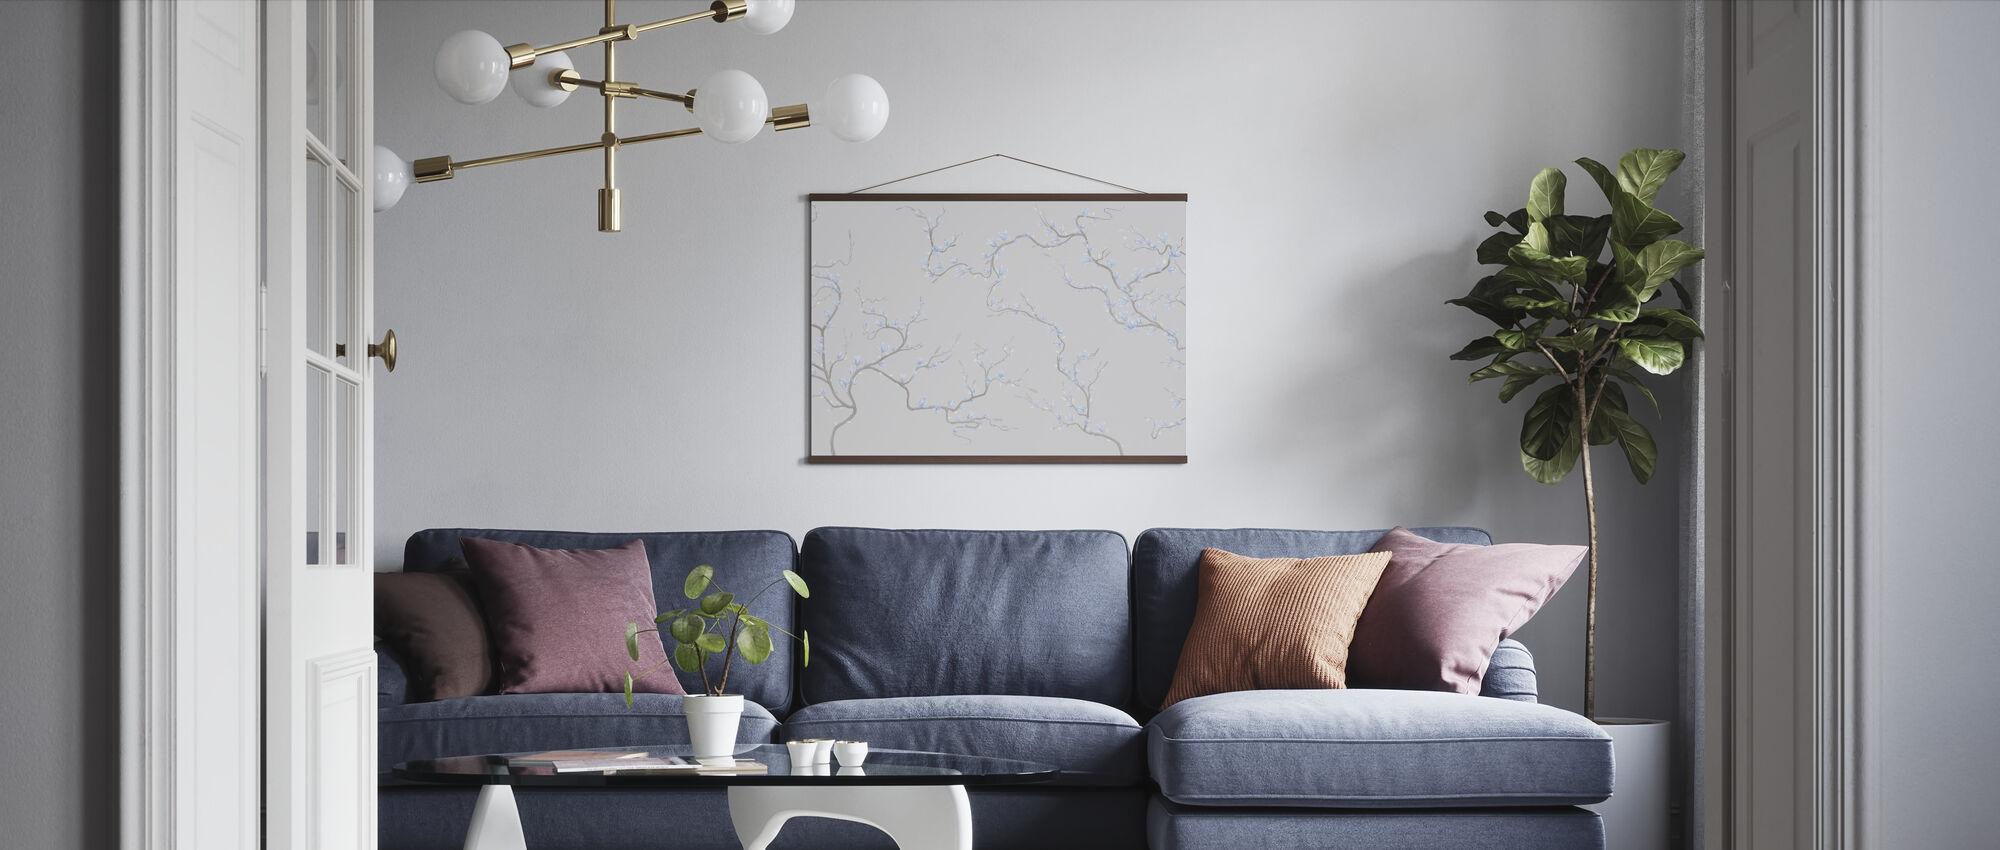 Flourishing Magnolia - Soft Gray - Poster - Living Room